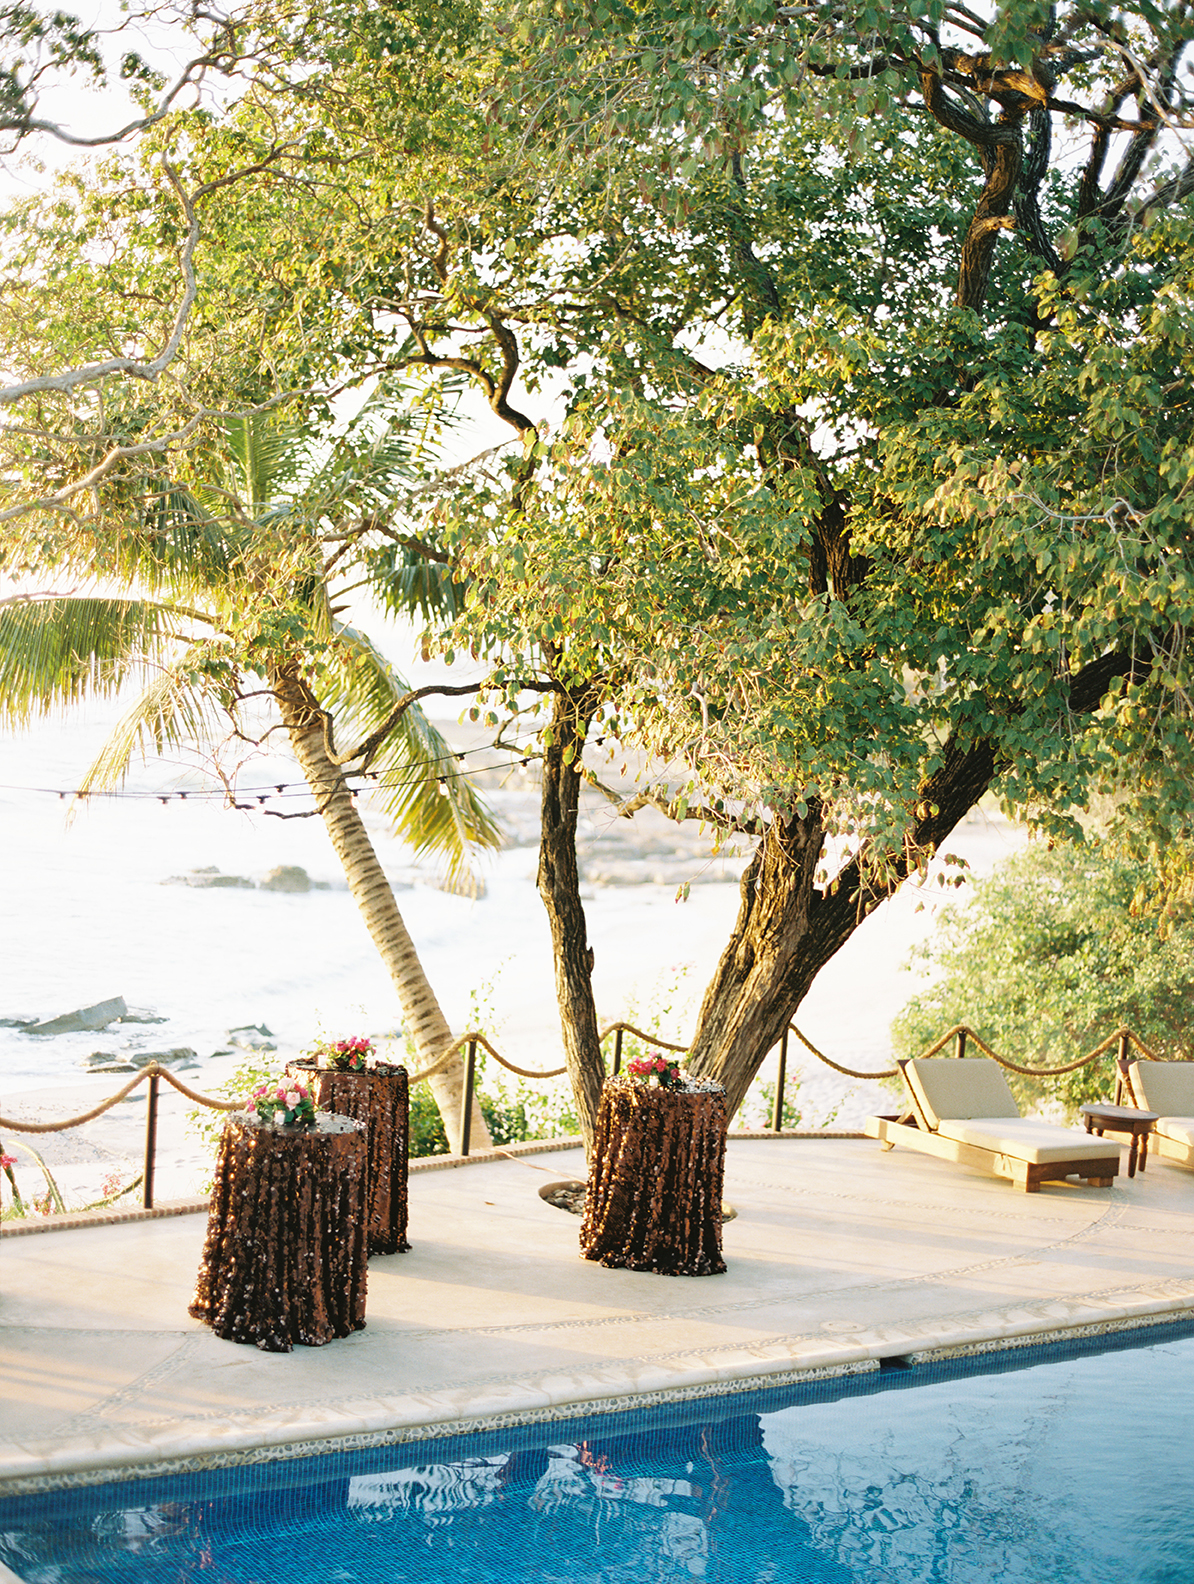 033-fine-art-film-photographer-wedding-engagement-jacob+cammye-destination-wedding-nicaragua-brumley & wells photography-rehearsal-dinner.jpg